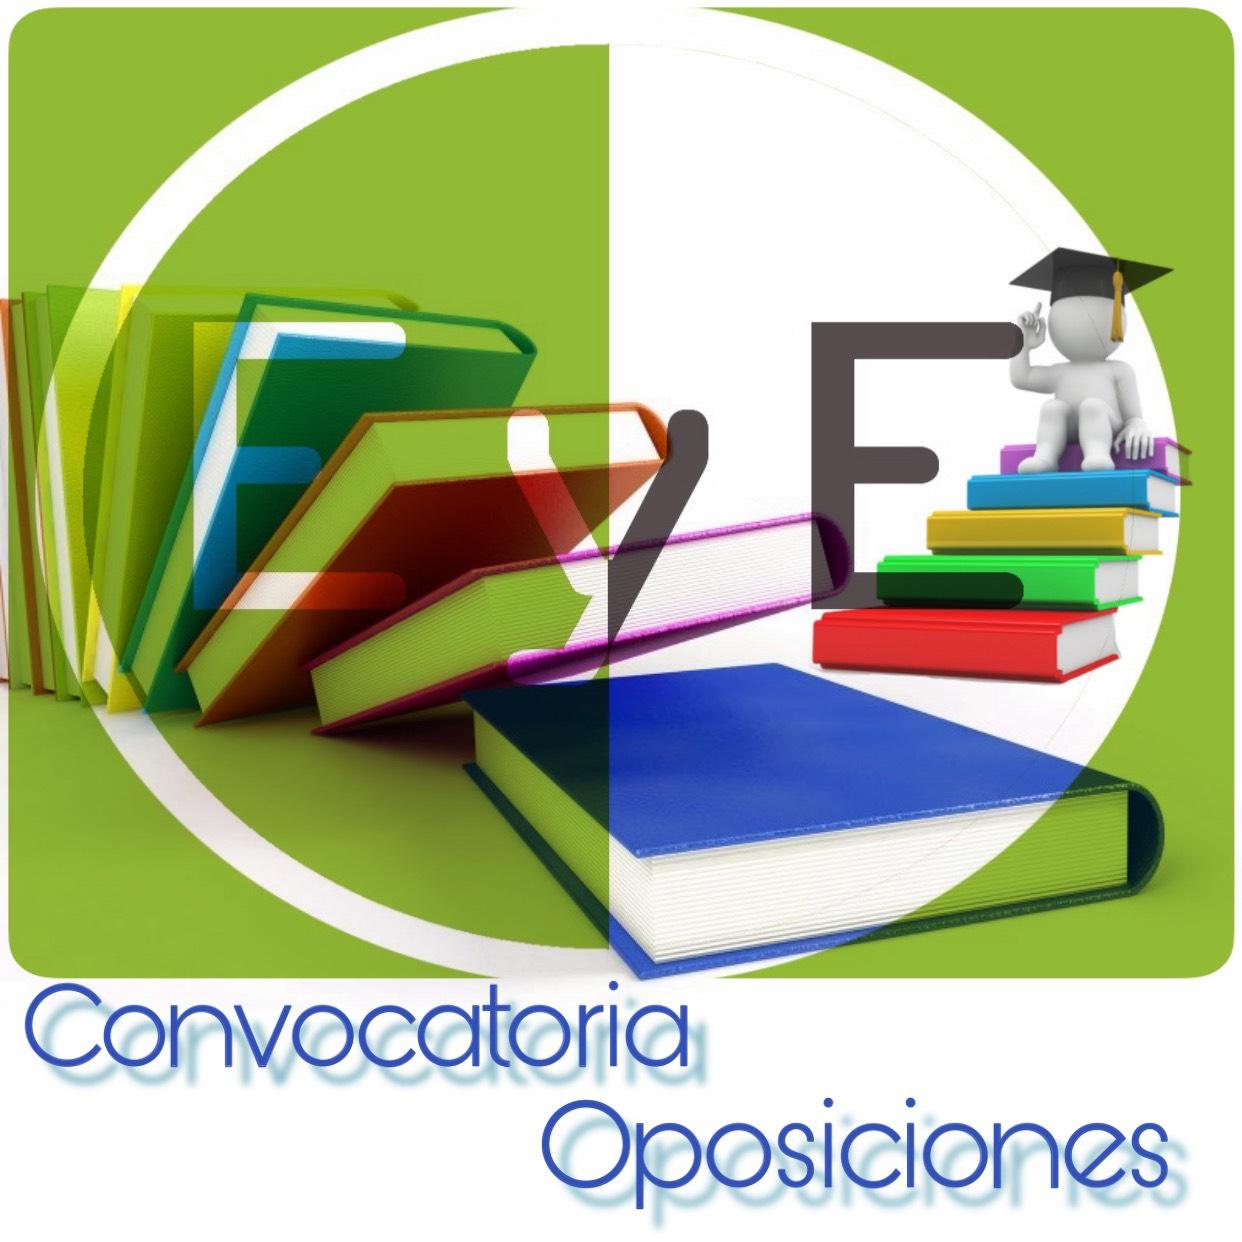 Convocatorias Oposiciones